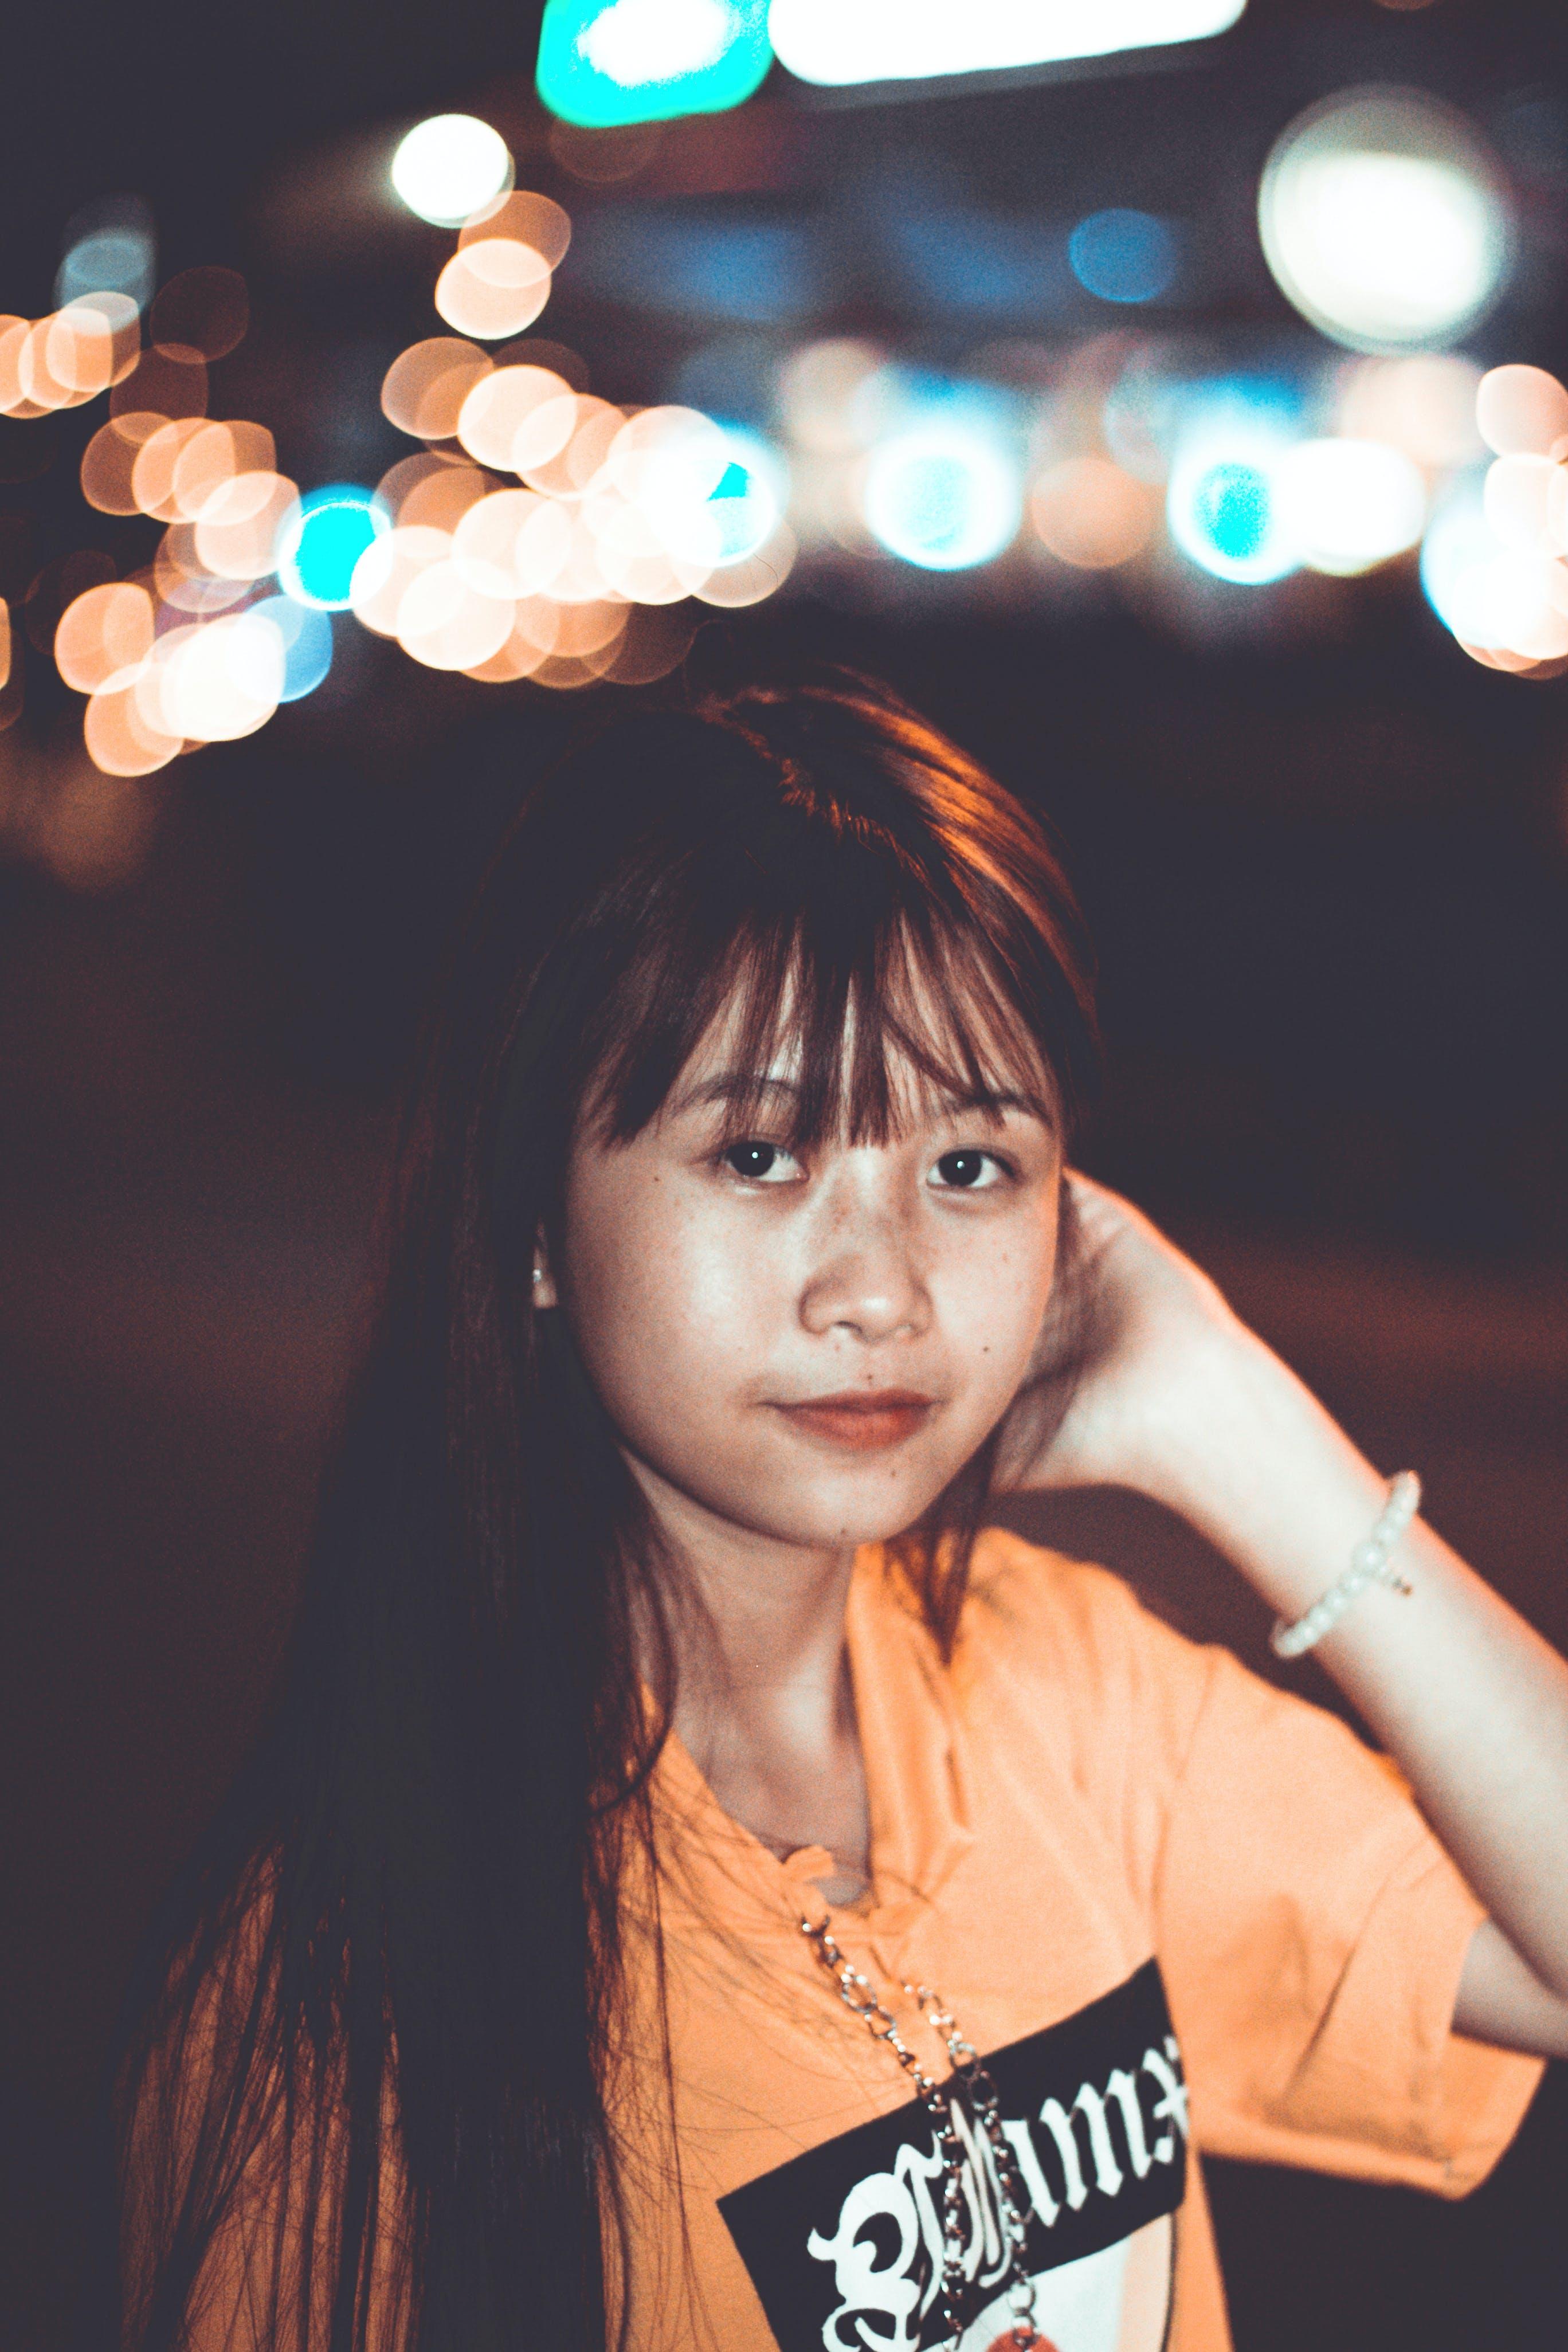 Fotos de stock gratuitas de adolescente, adulto, asiática, cantante